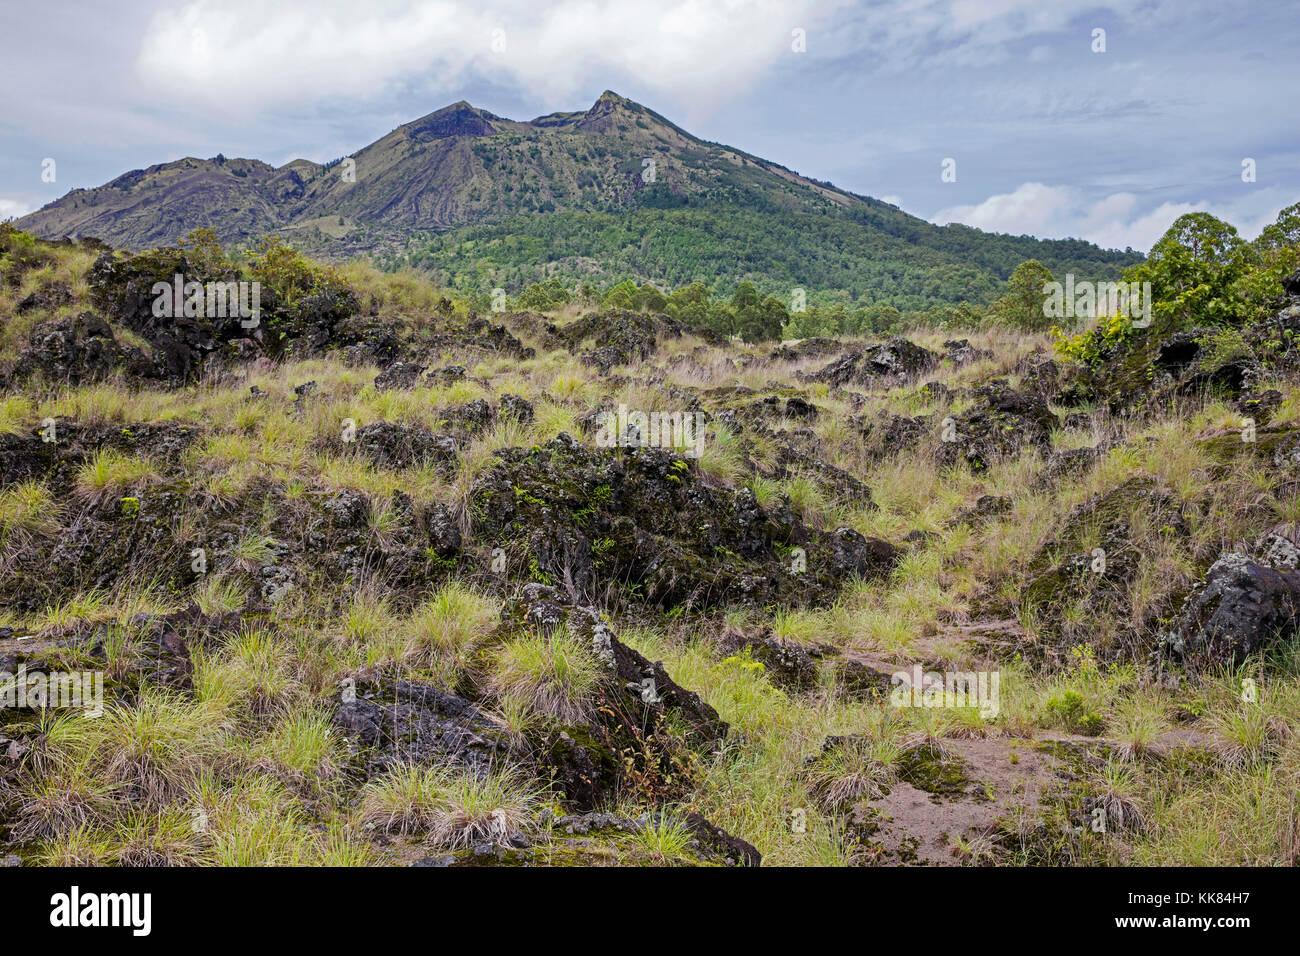 Lava field and caldera on Mount Batur / Gunung Batur, active volcano in the Bangli Regency, Bali, Indonesia - Stock Image